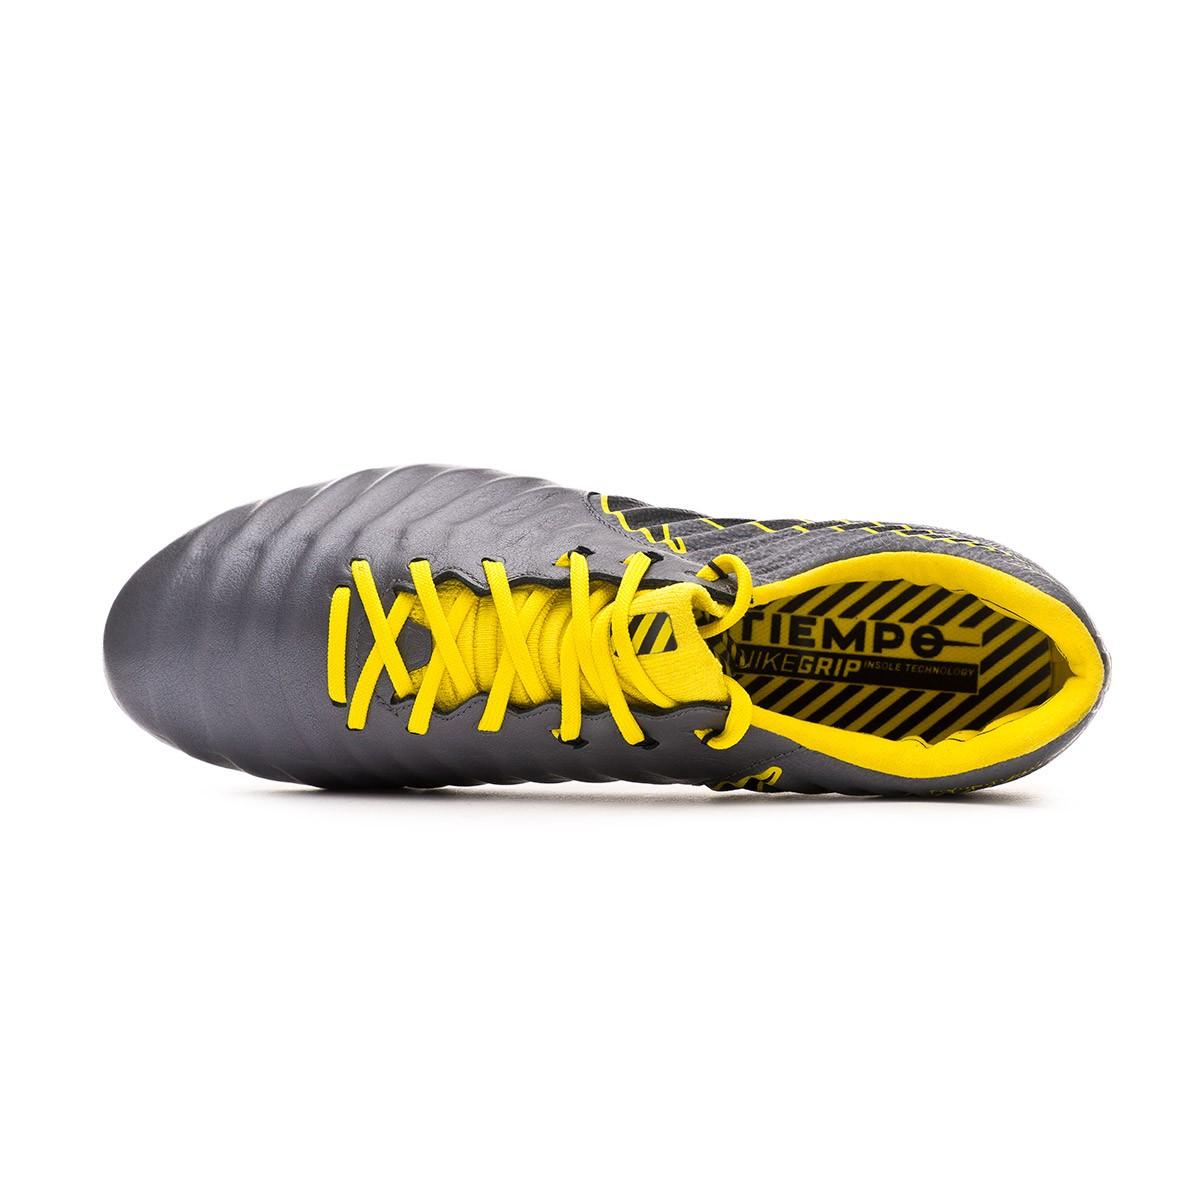 5ec12e00b Football Boots Nike Tiempo Legend VII Elite AG-Pro Dark grey-Black-Optical  yellow - Football store Fútbol Emotion